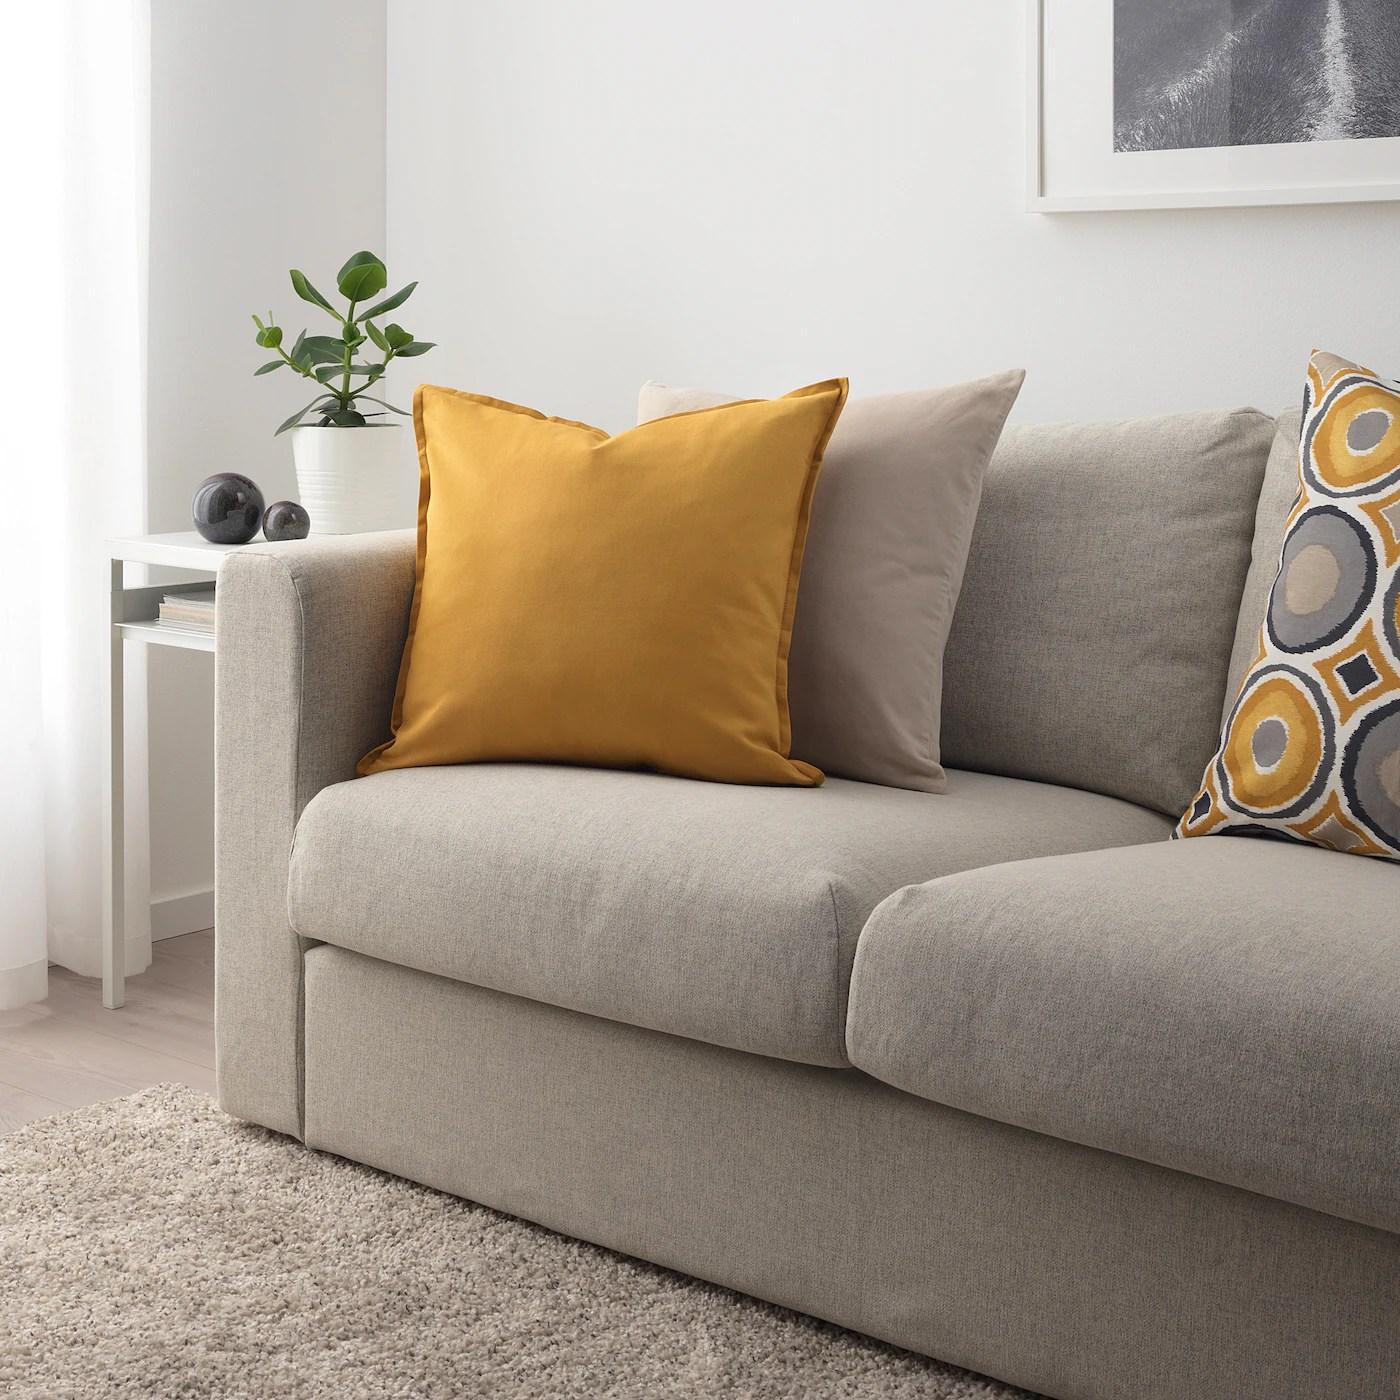 gurli housse de coussin jaune dore 50x50 cm